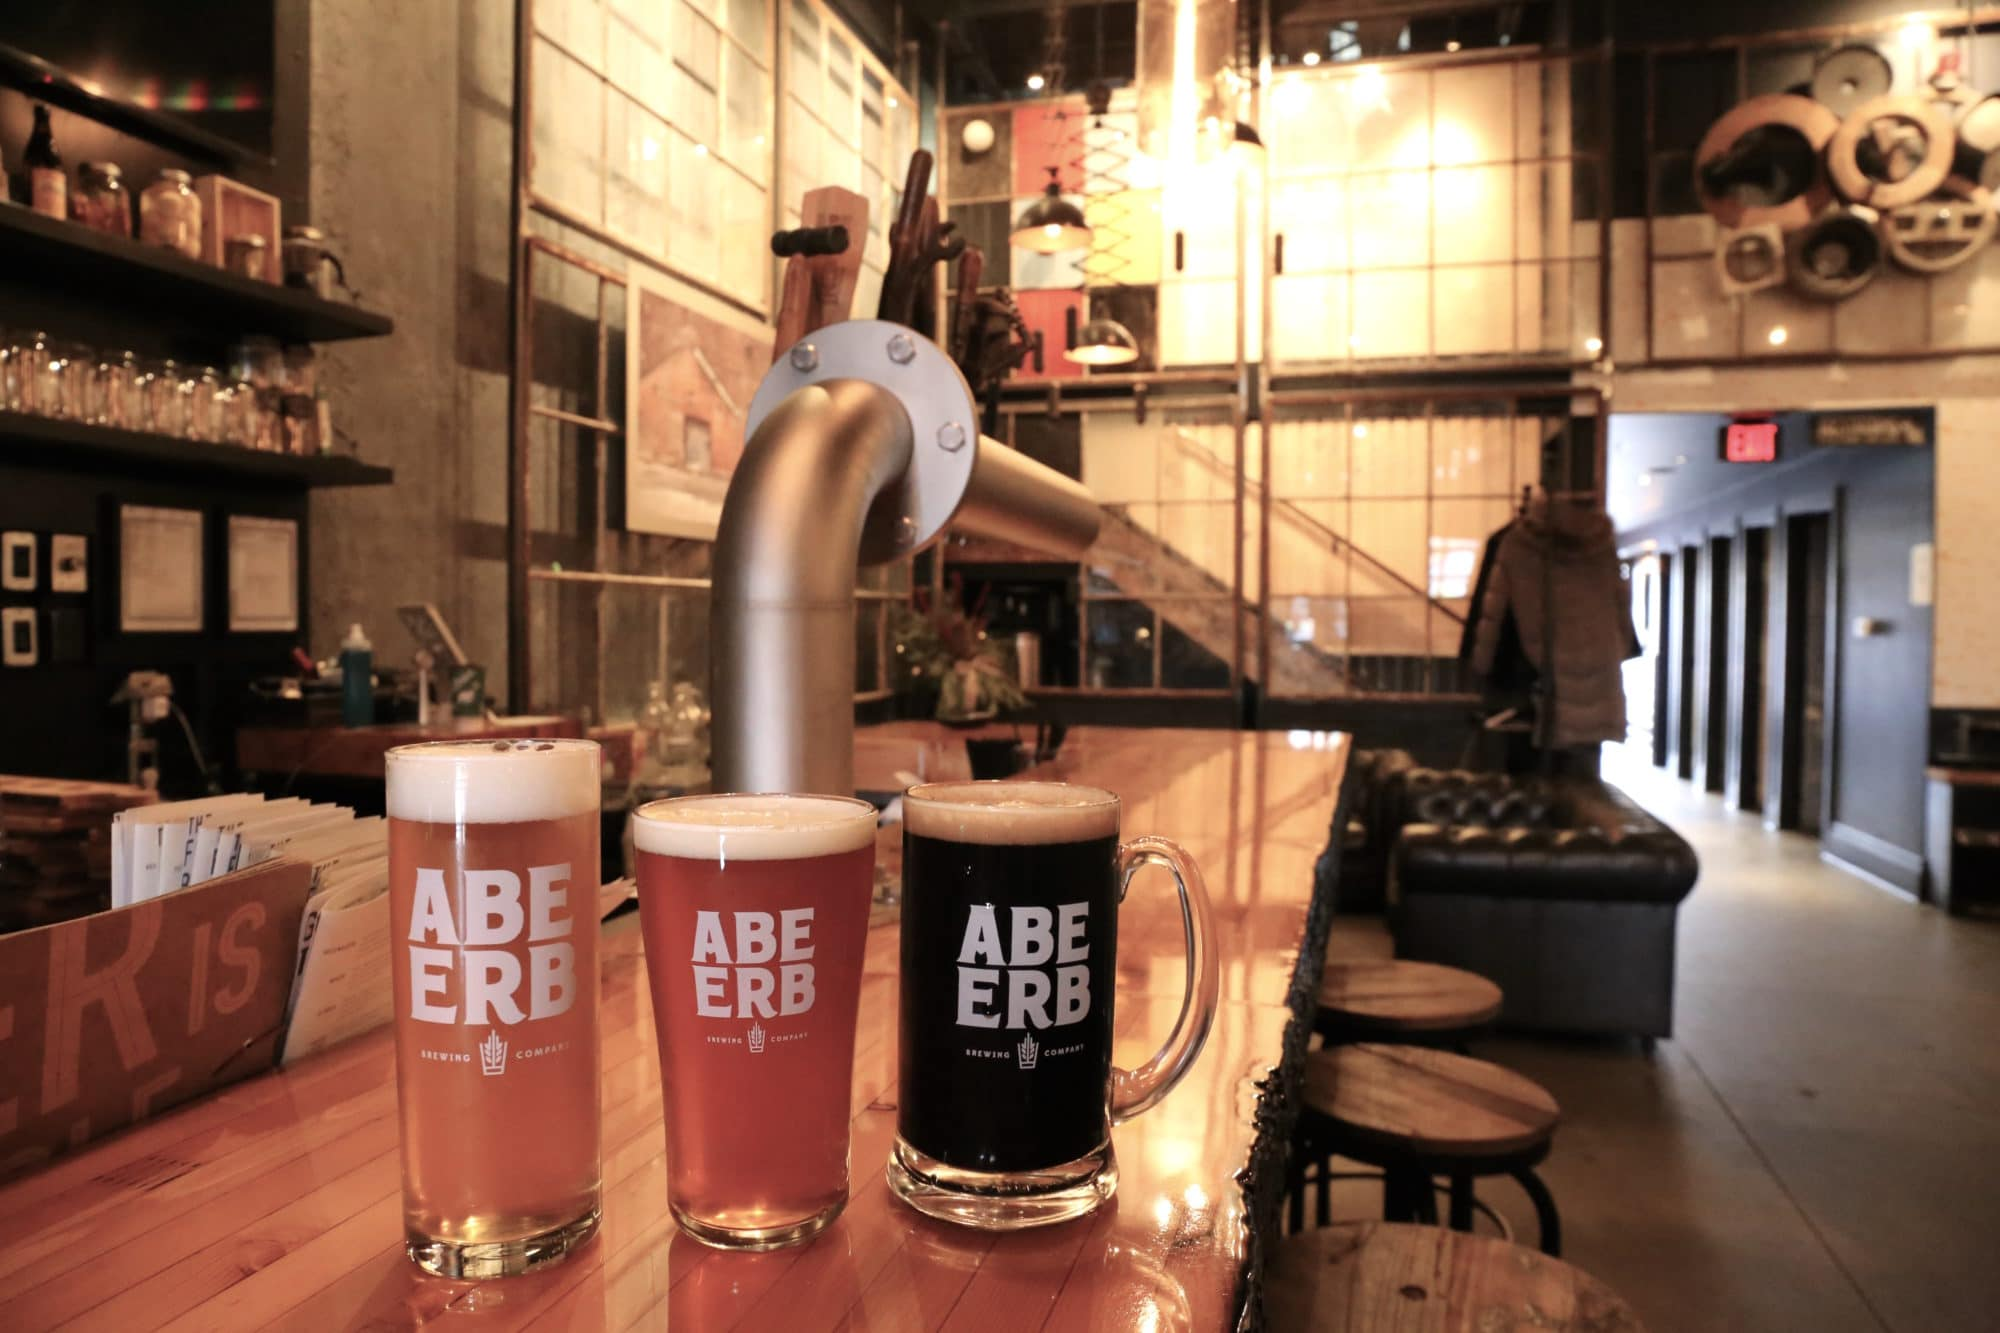 Enjoy a craft beer sampling at Abe Erb Waterloo's brewery and restaurant.